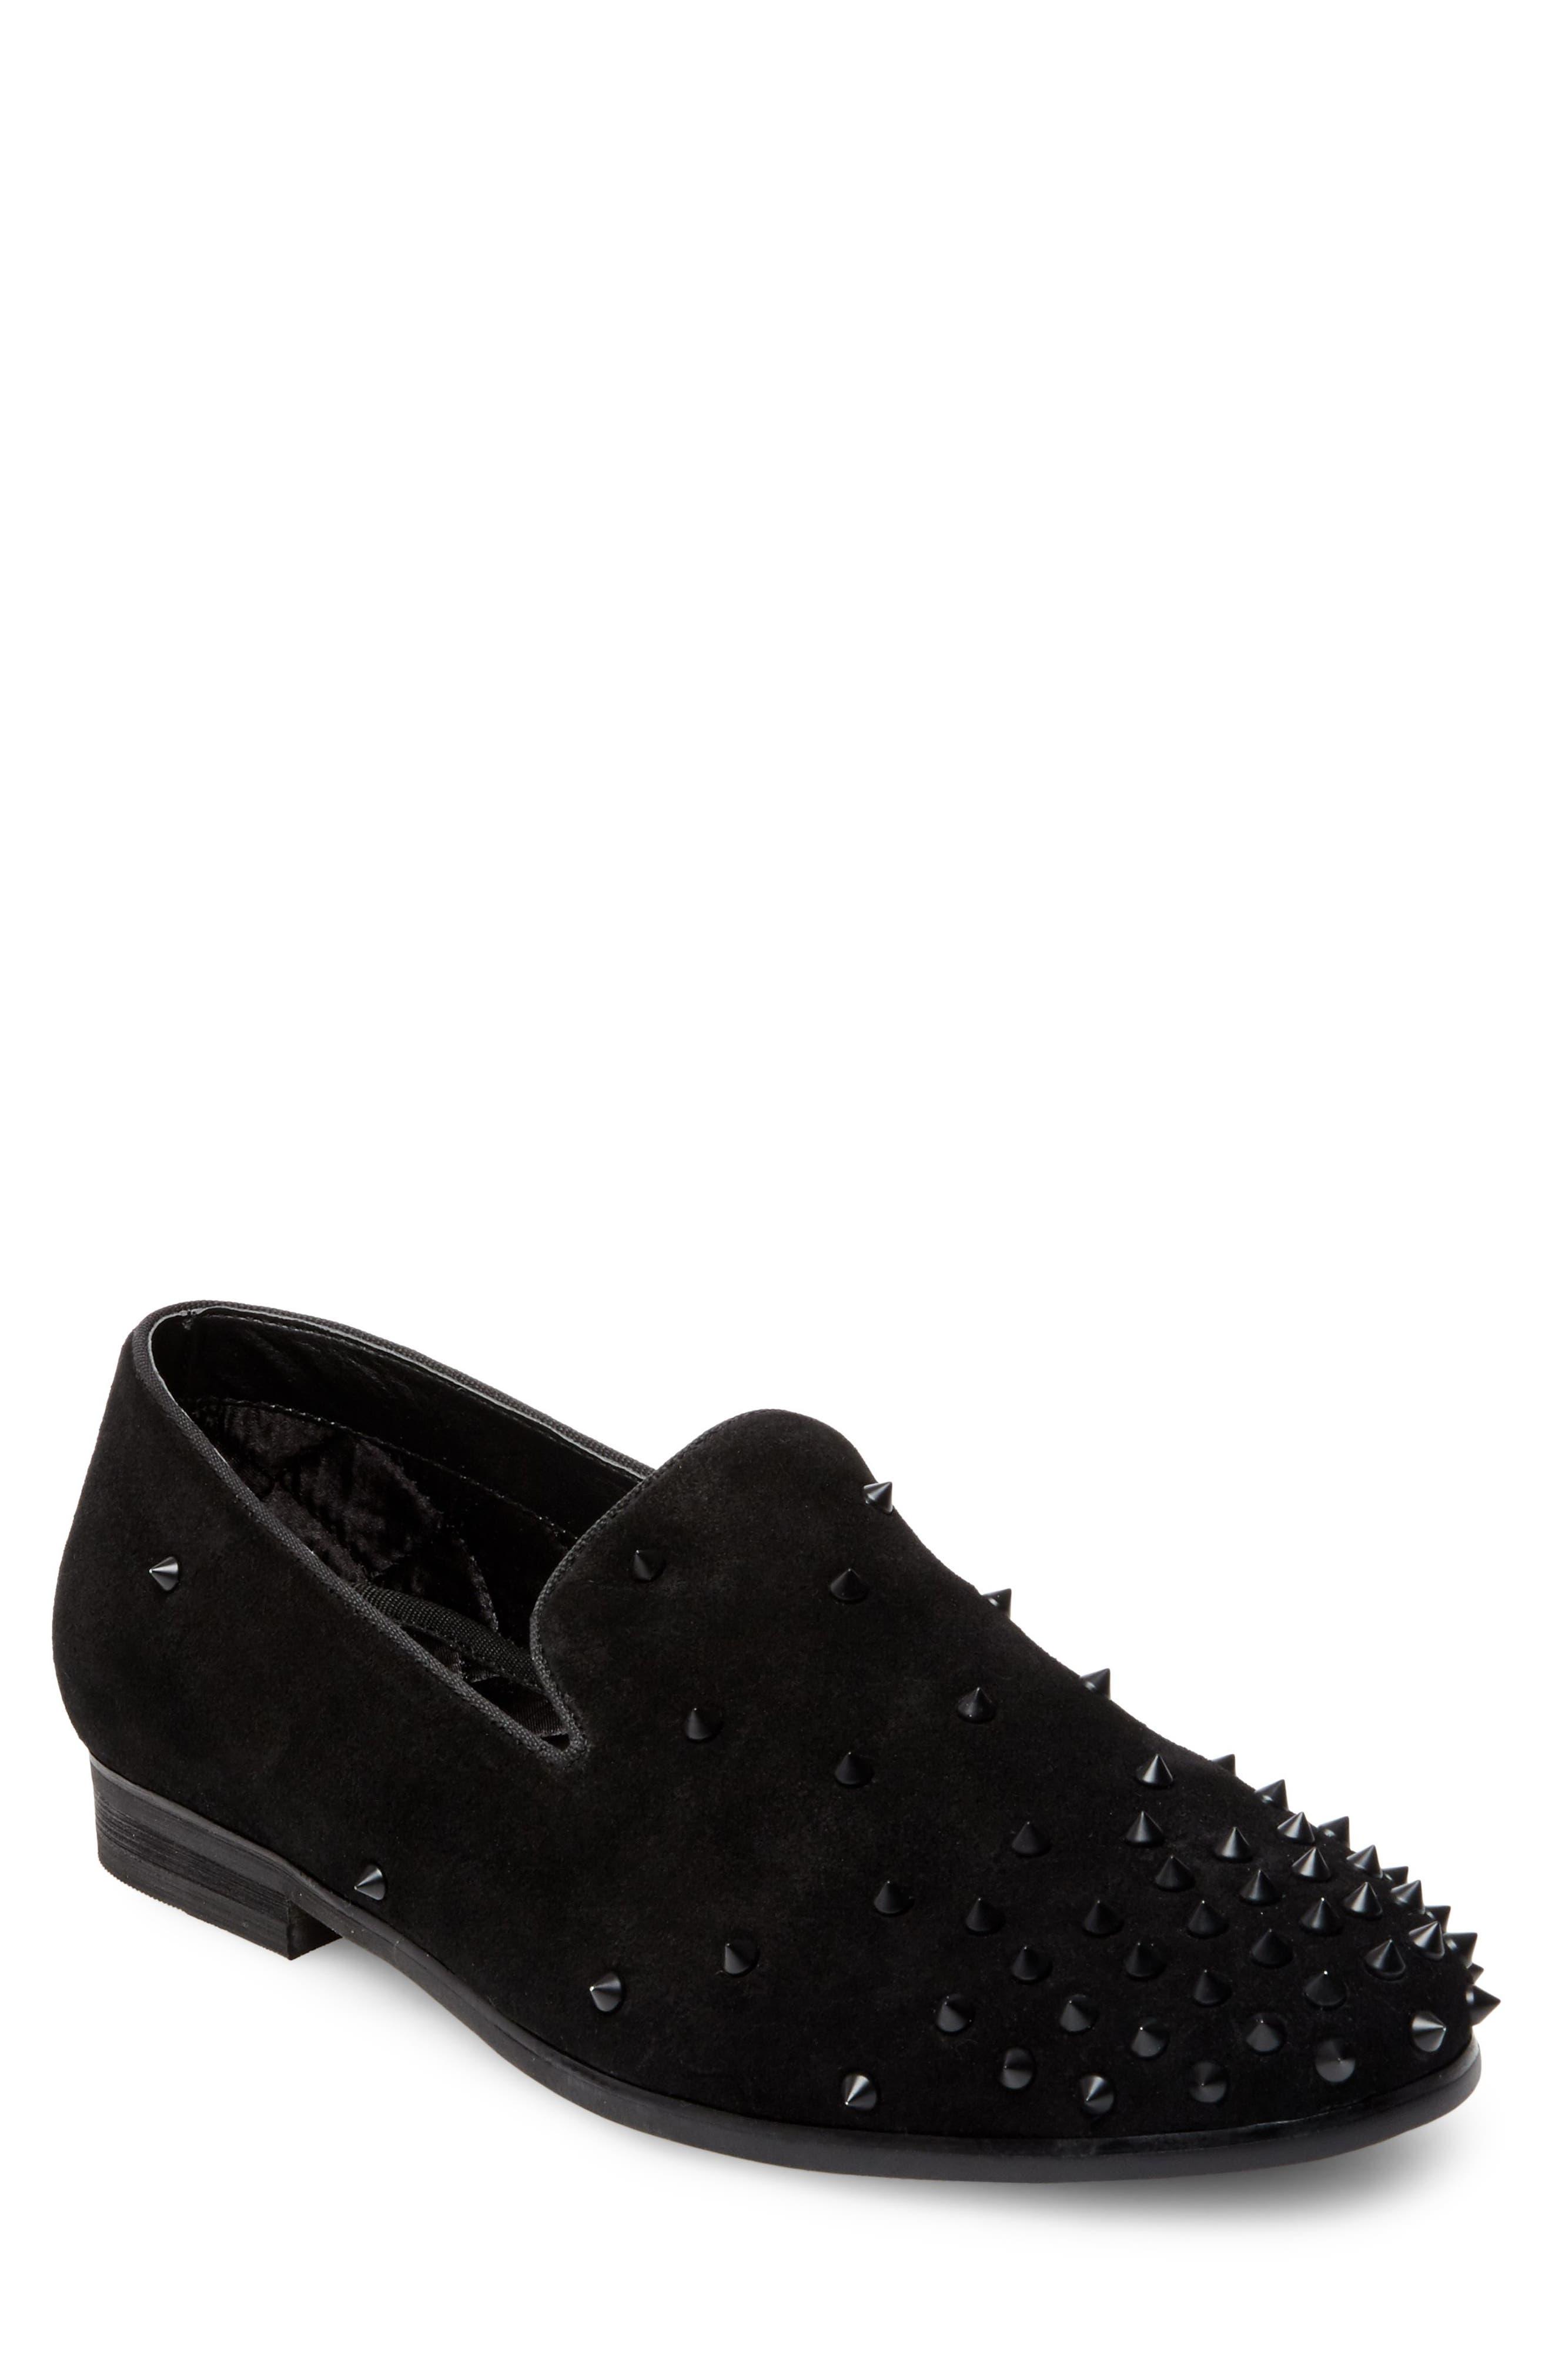 Cascade Studded Loafer,                         Main,                         color, 001